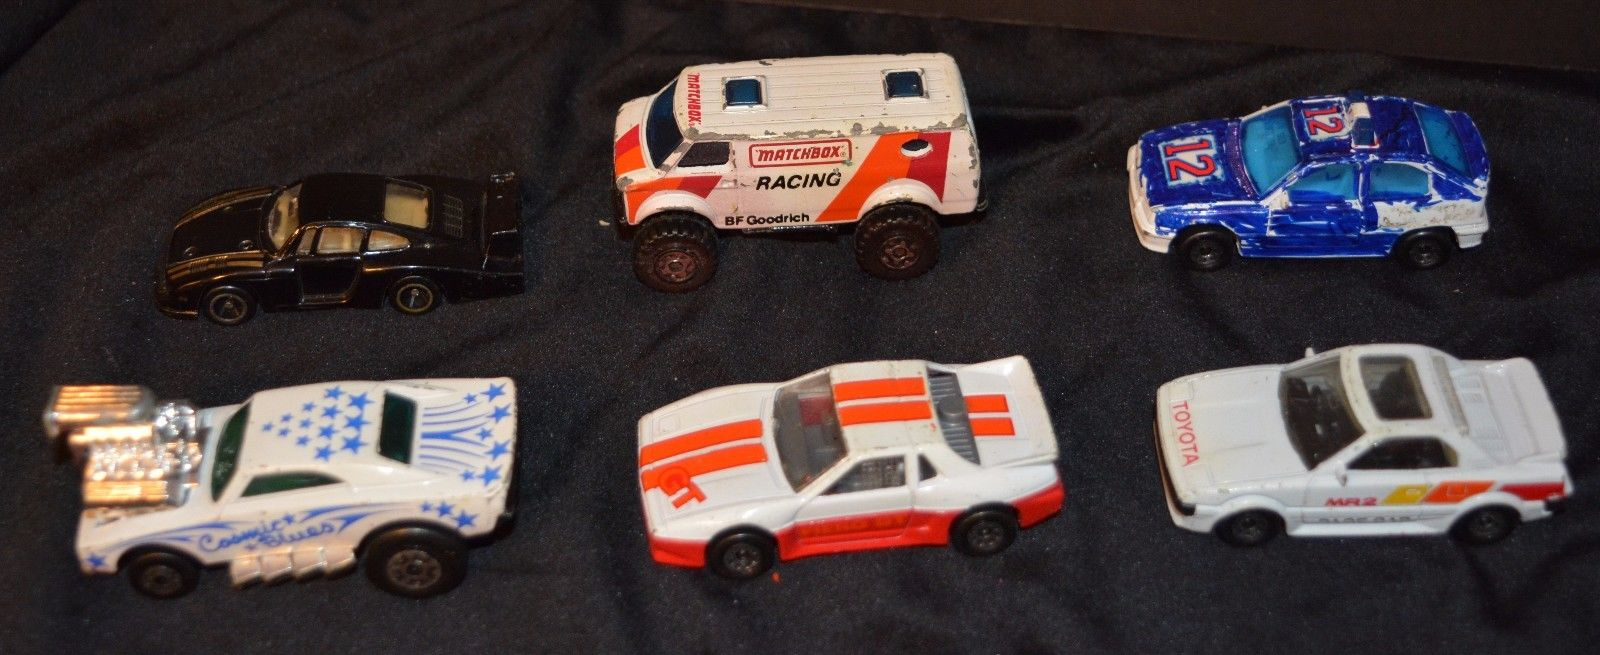 SIX 1980s Matchbox Cars Chevy Van Pontiac Fiero Porsche Vauxhall Astra GTE Opel